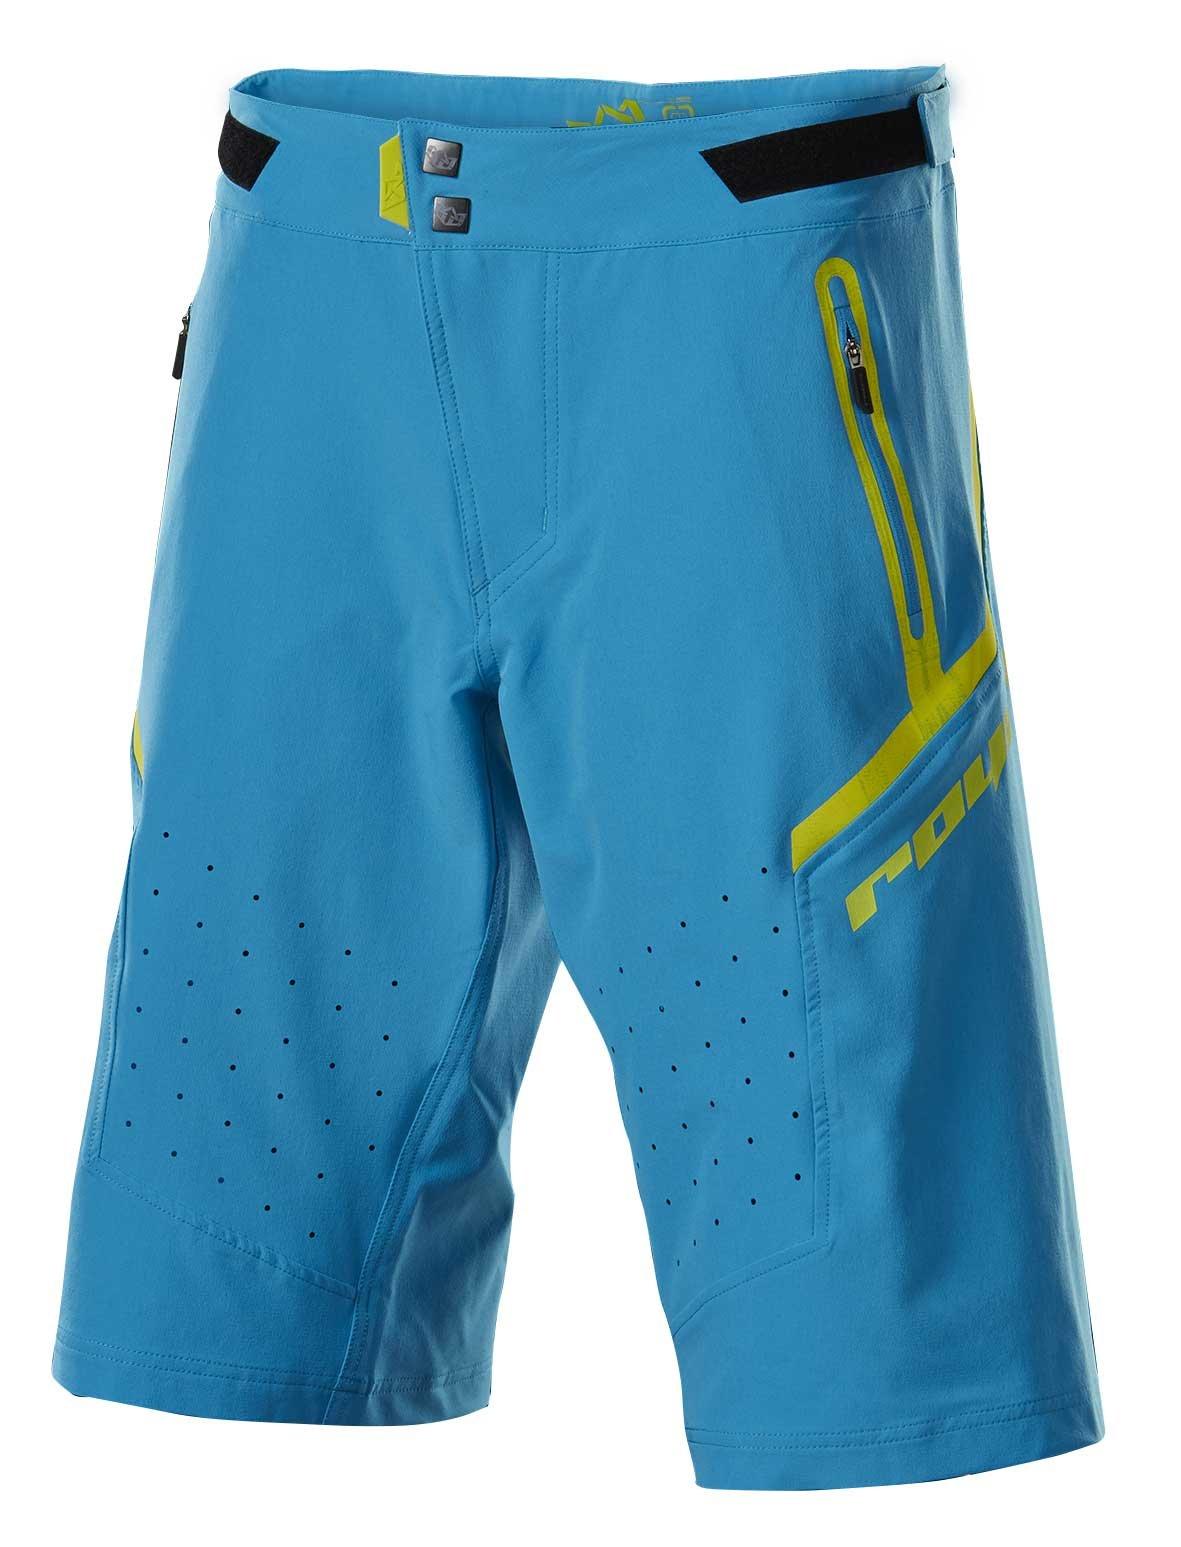 Royal Racing Impact Shorts, Electric Blue/Midori Citric Acid, X-Large